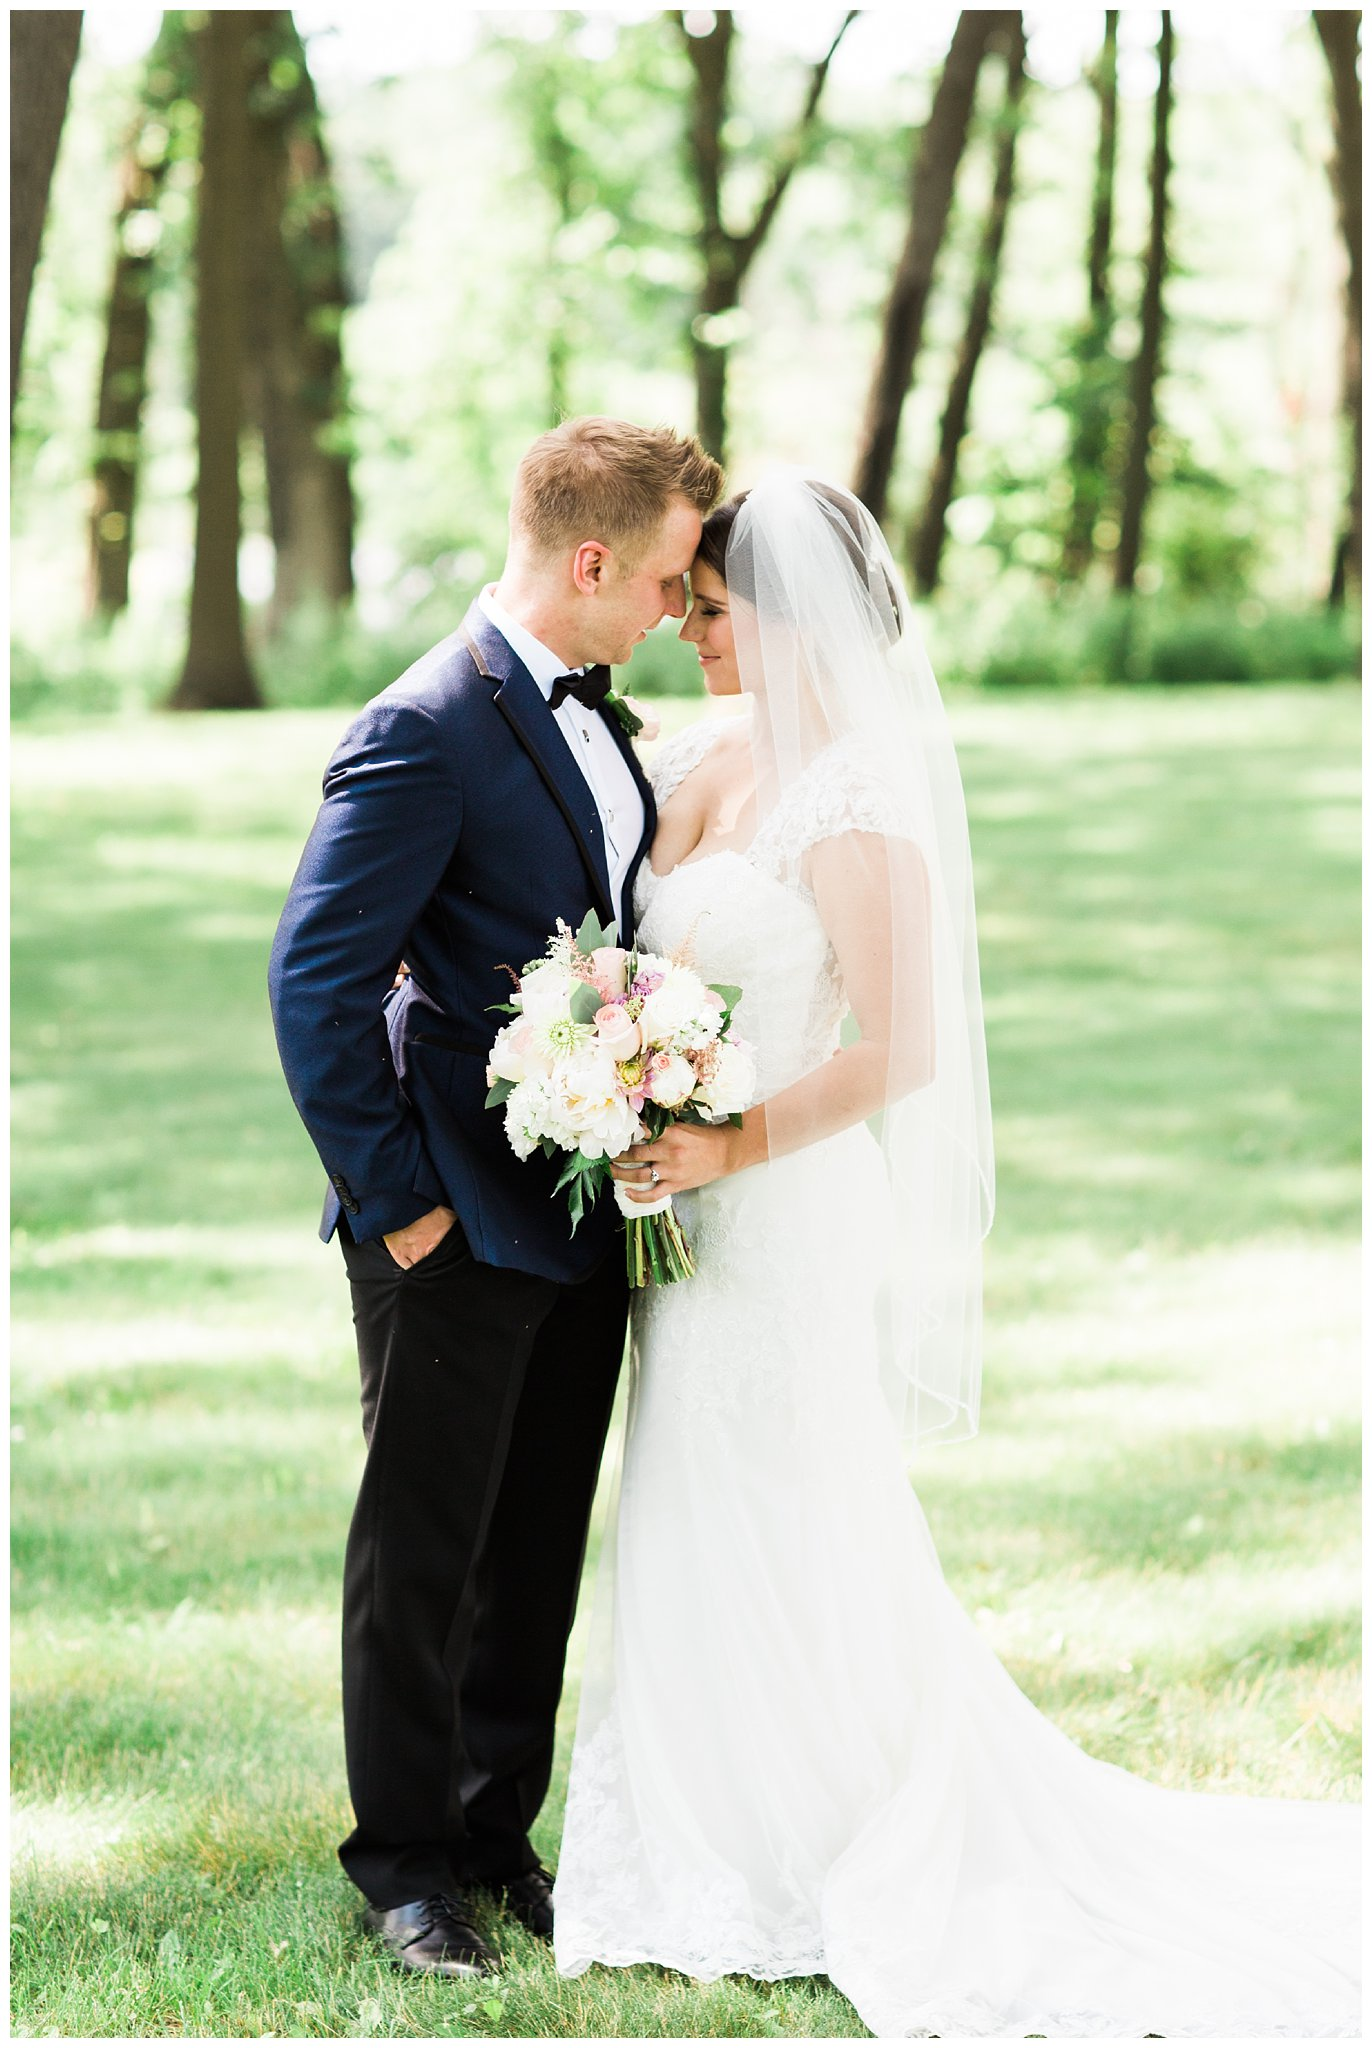 Alicia&Kurt_RavisloeCountryClubWedding_Chicagoweddingphotographer_RebeccaHaleyPhotography_0154.jpg